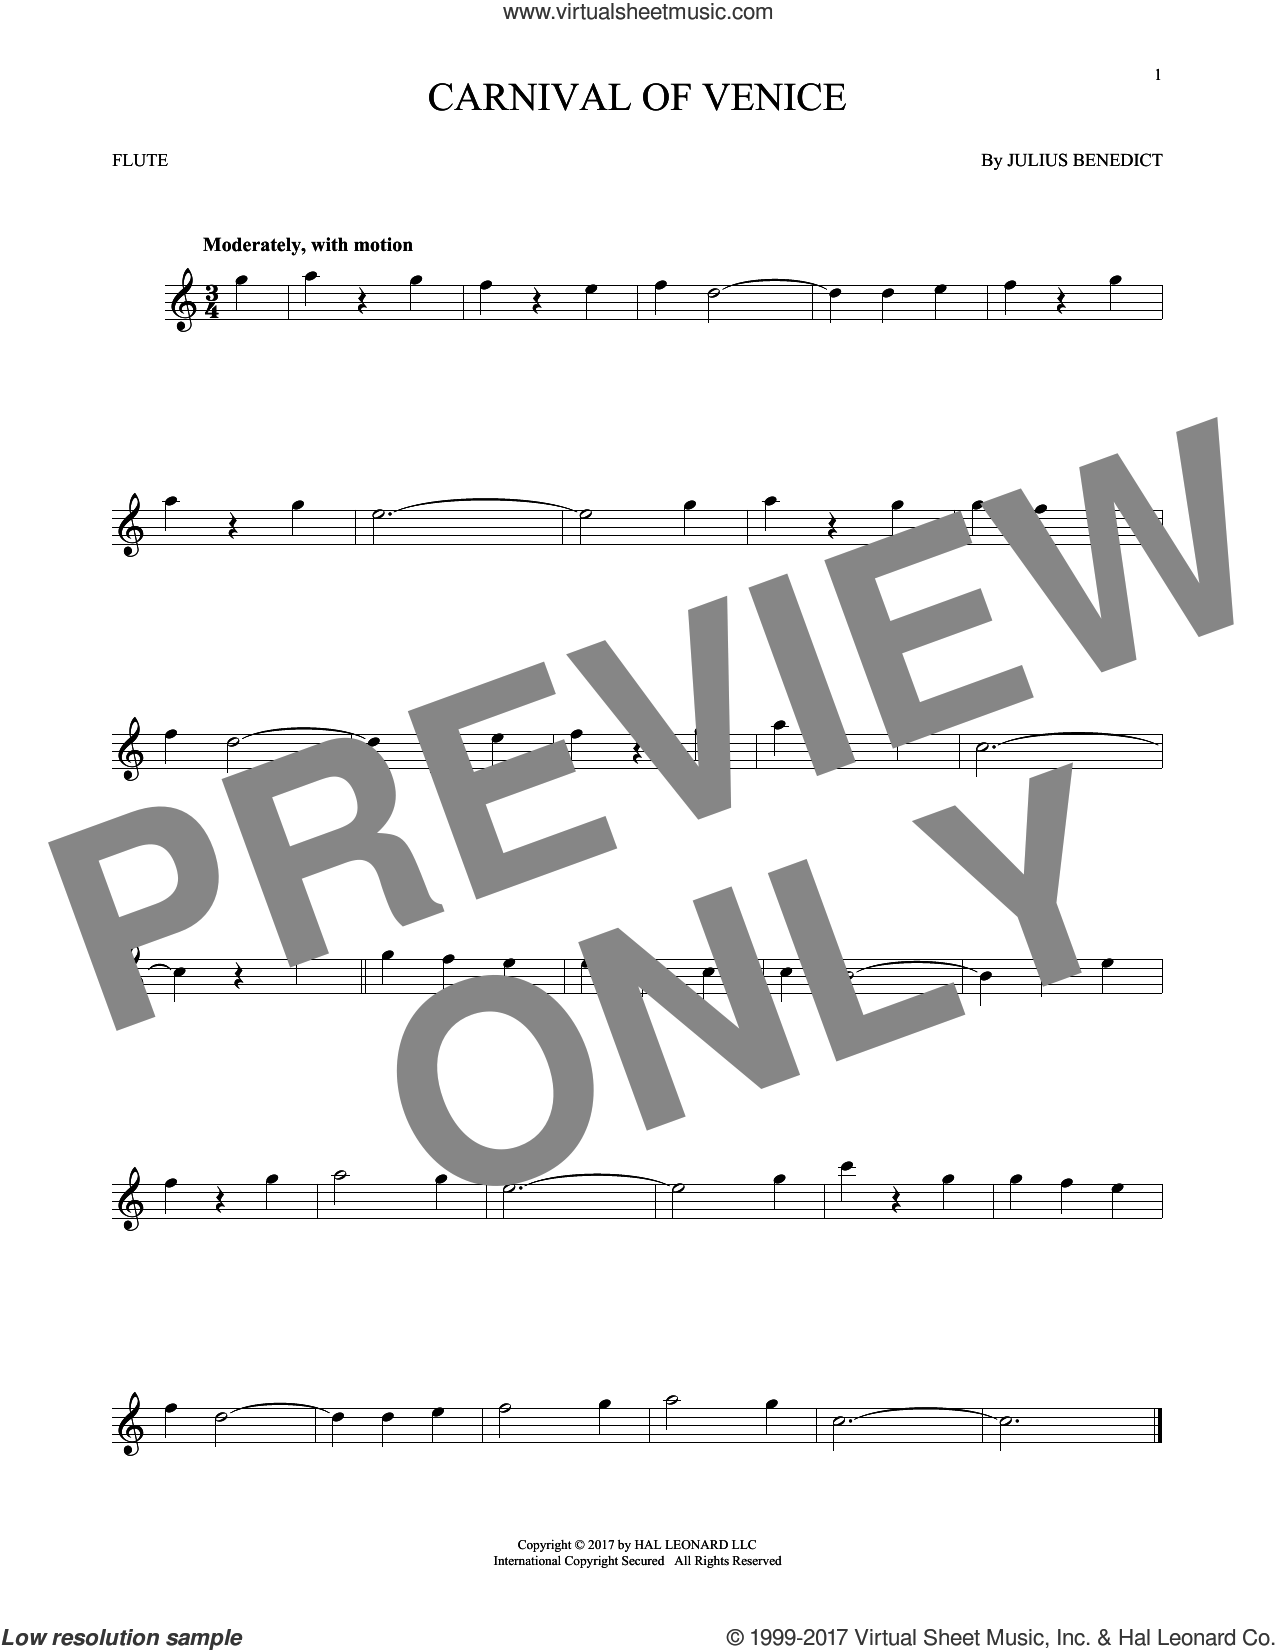 Carnival Of Venice sheet music for flute solo by Julius Benedict, intermediate skill level